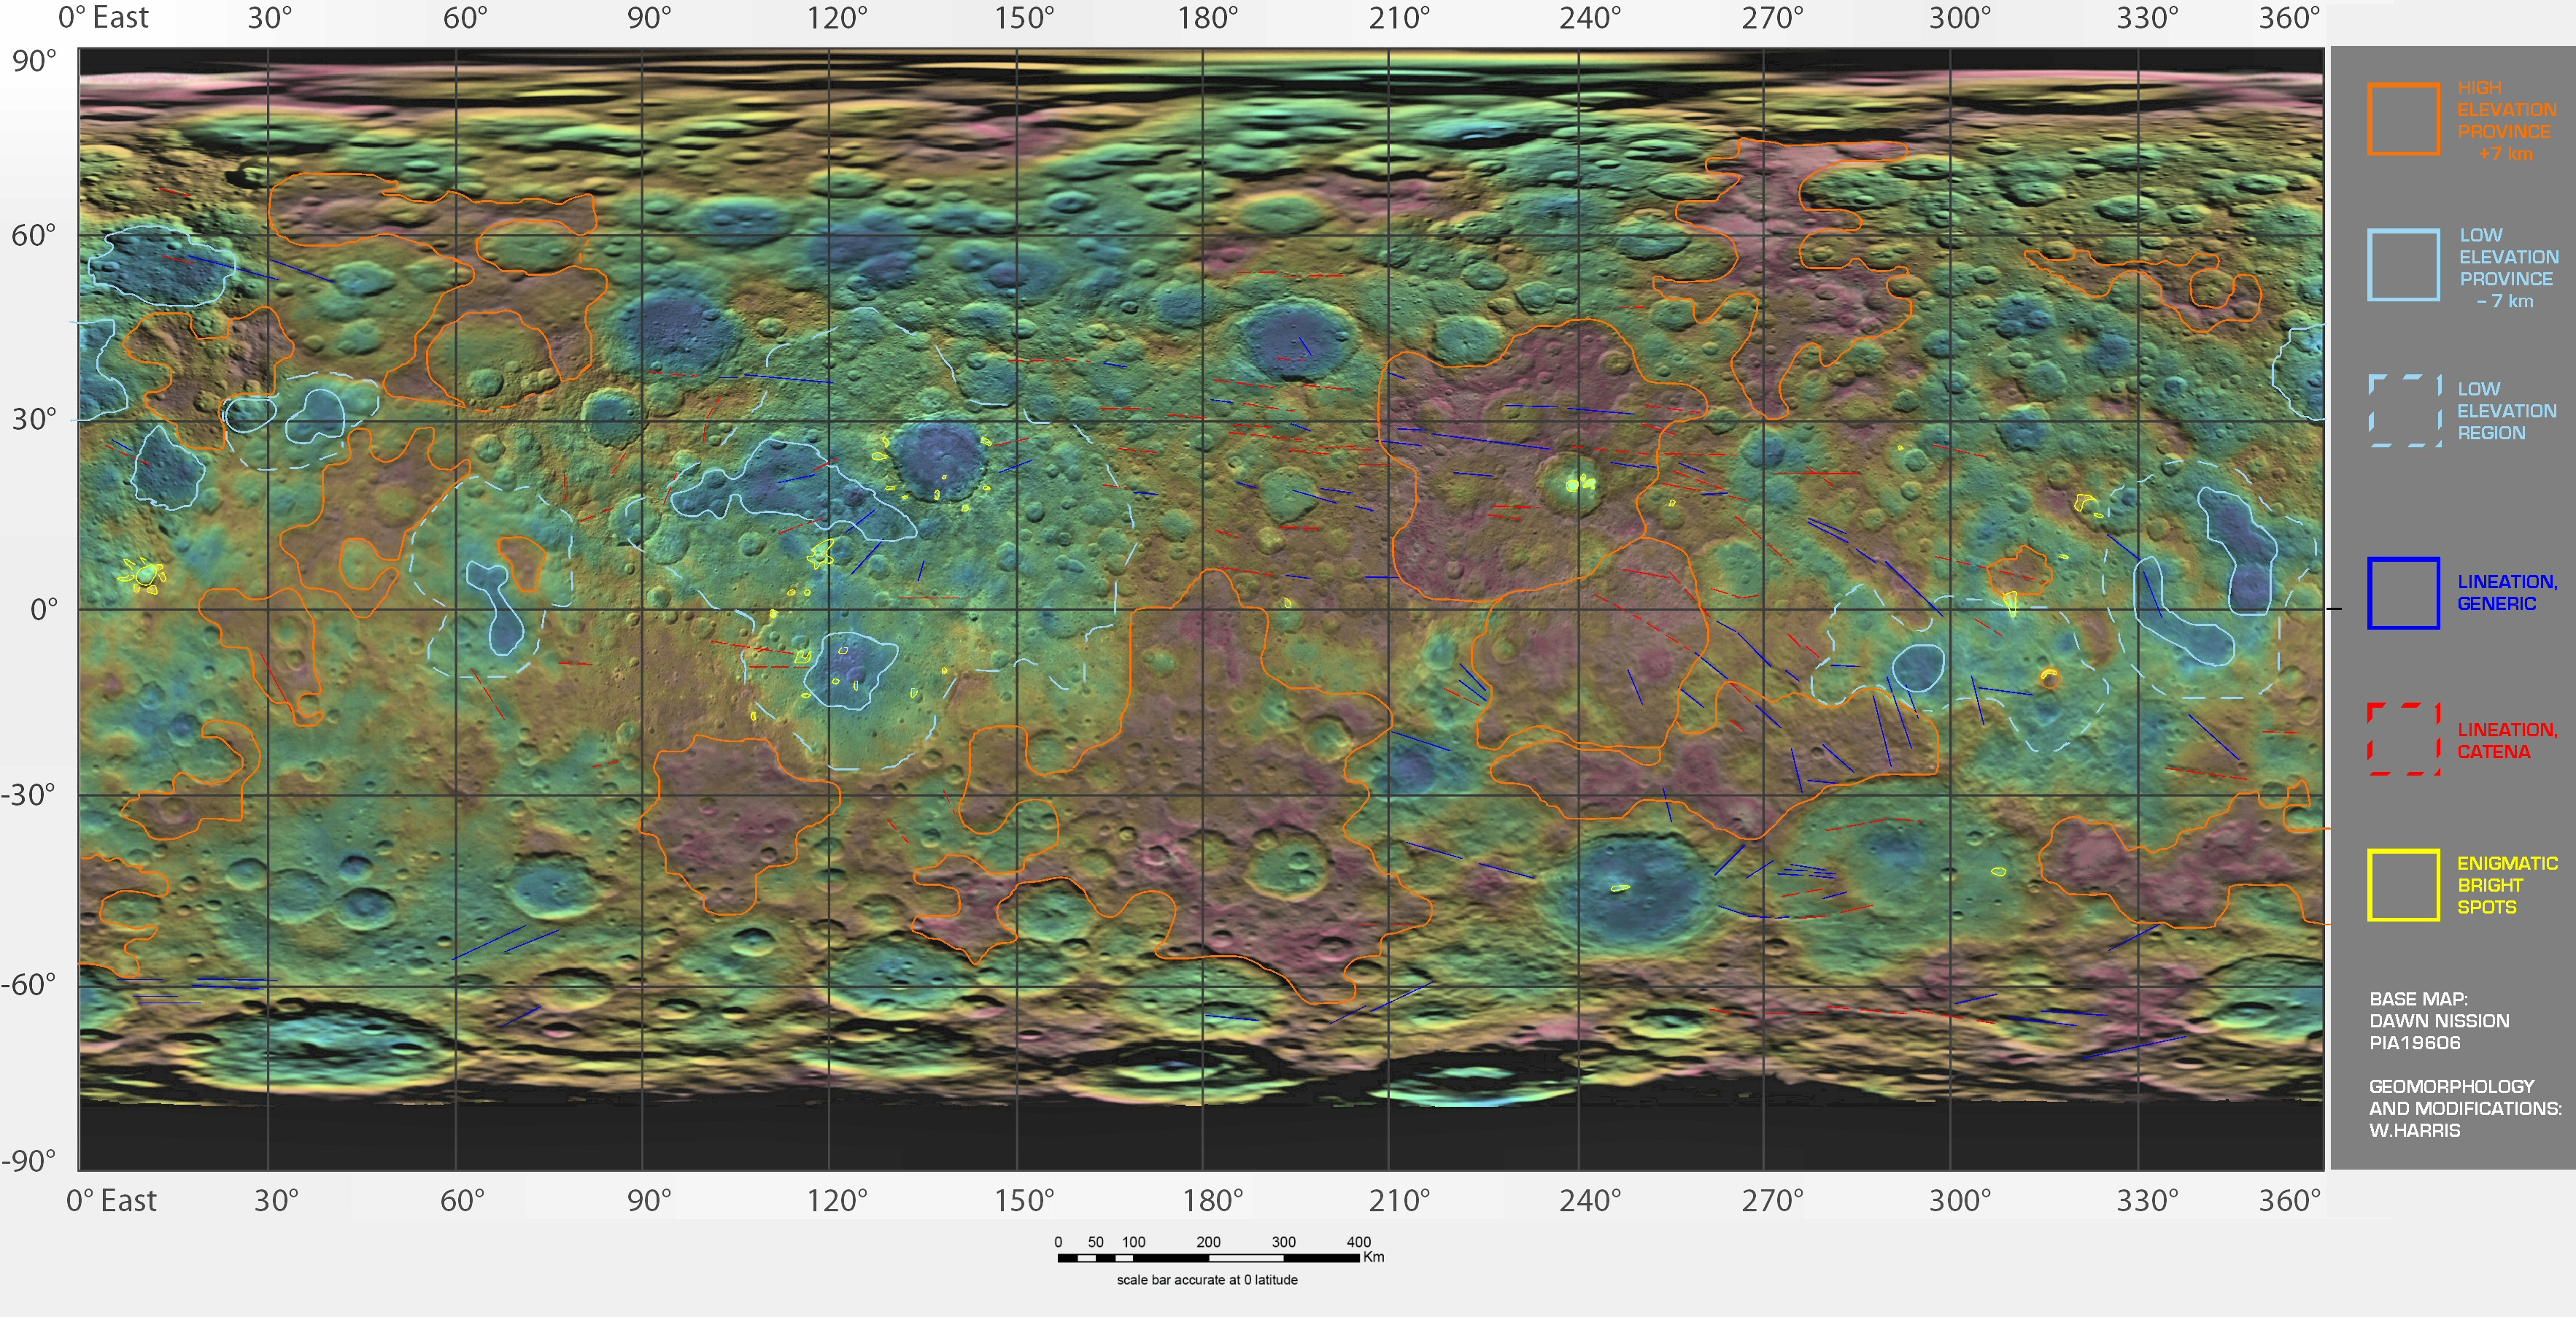 [Image: PIA19606_fig1--geomorph-v1.jpg]